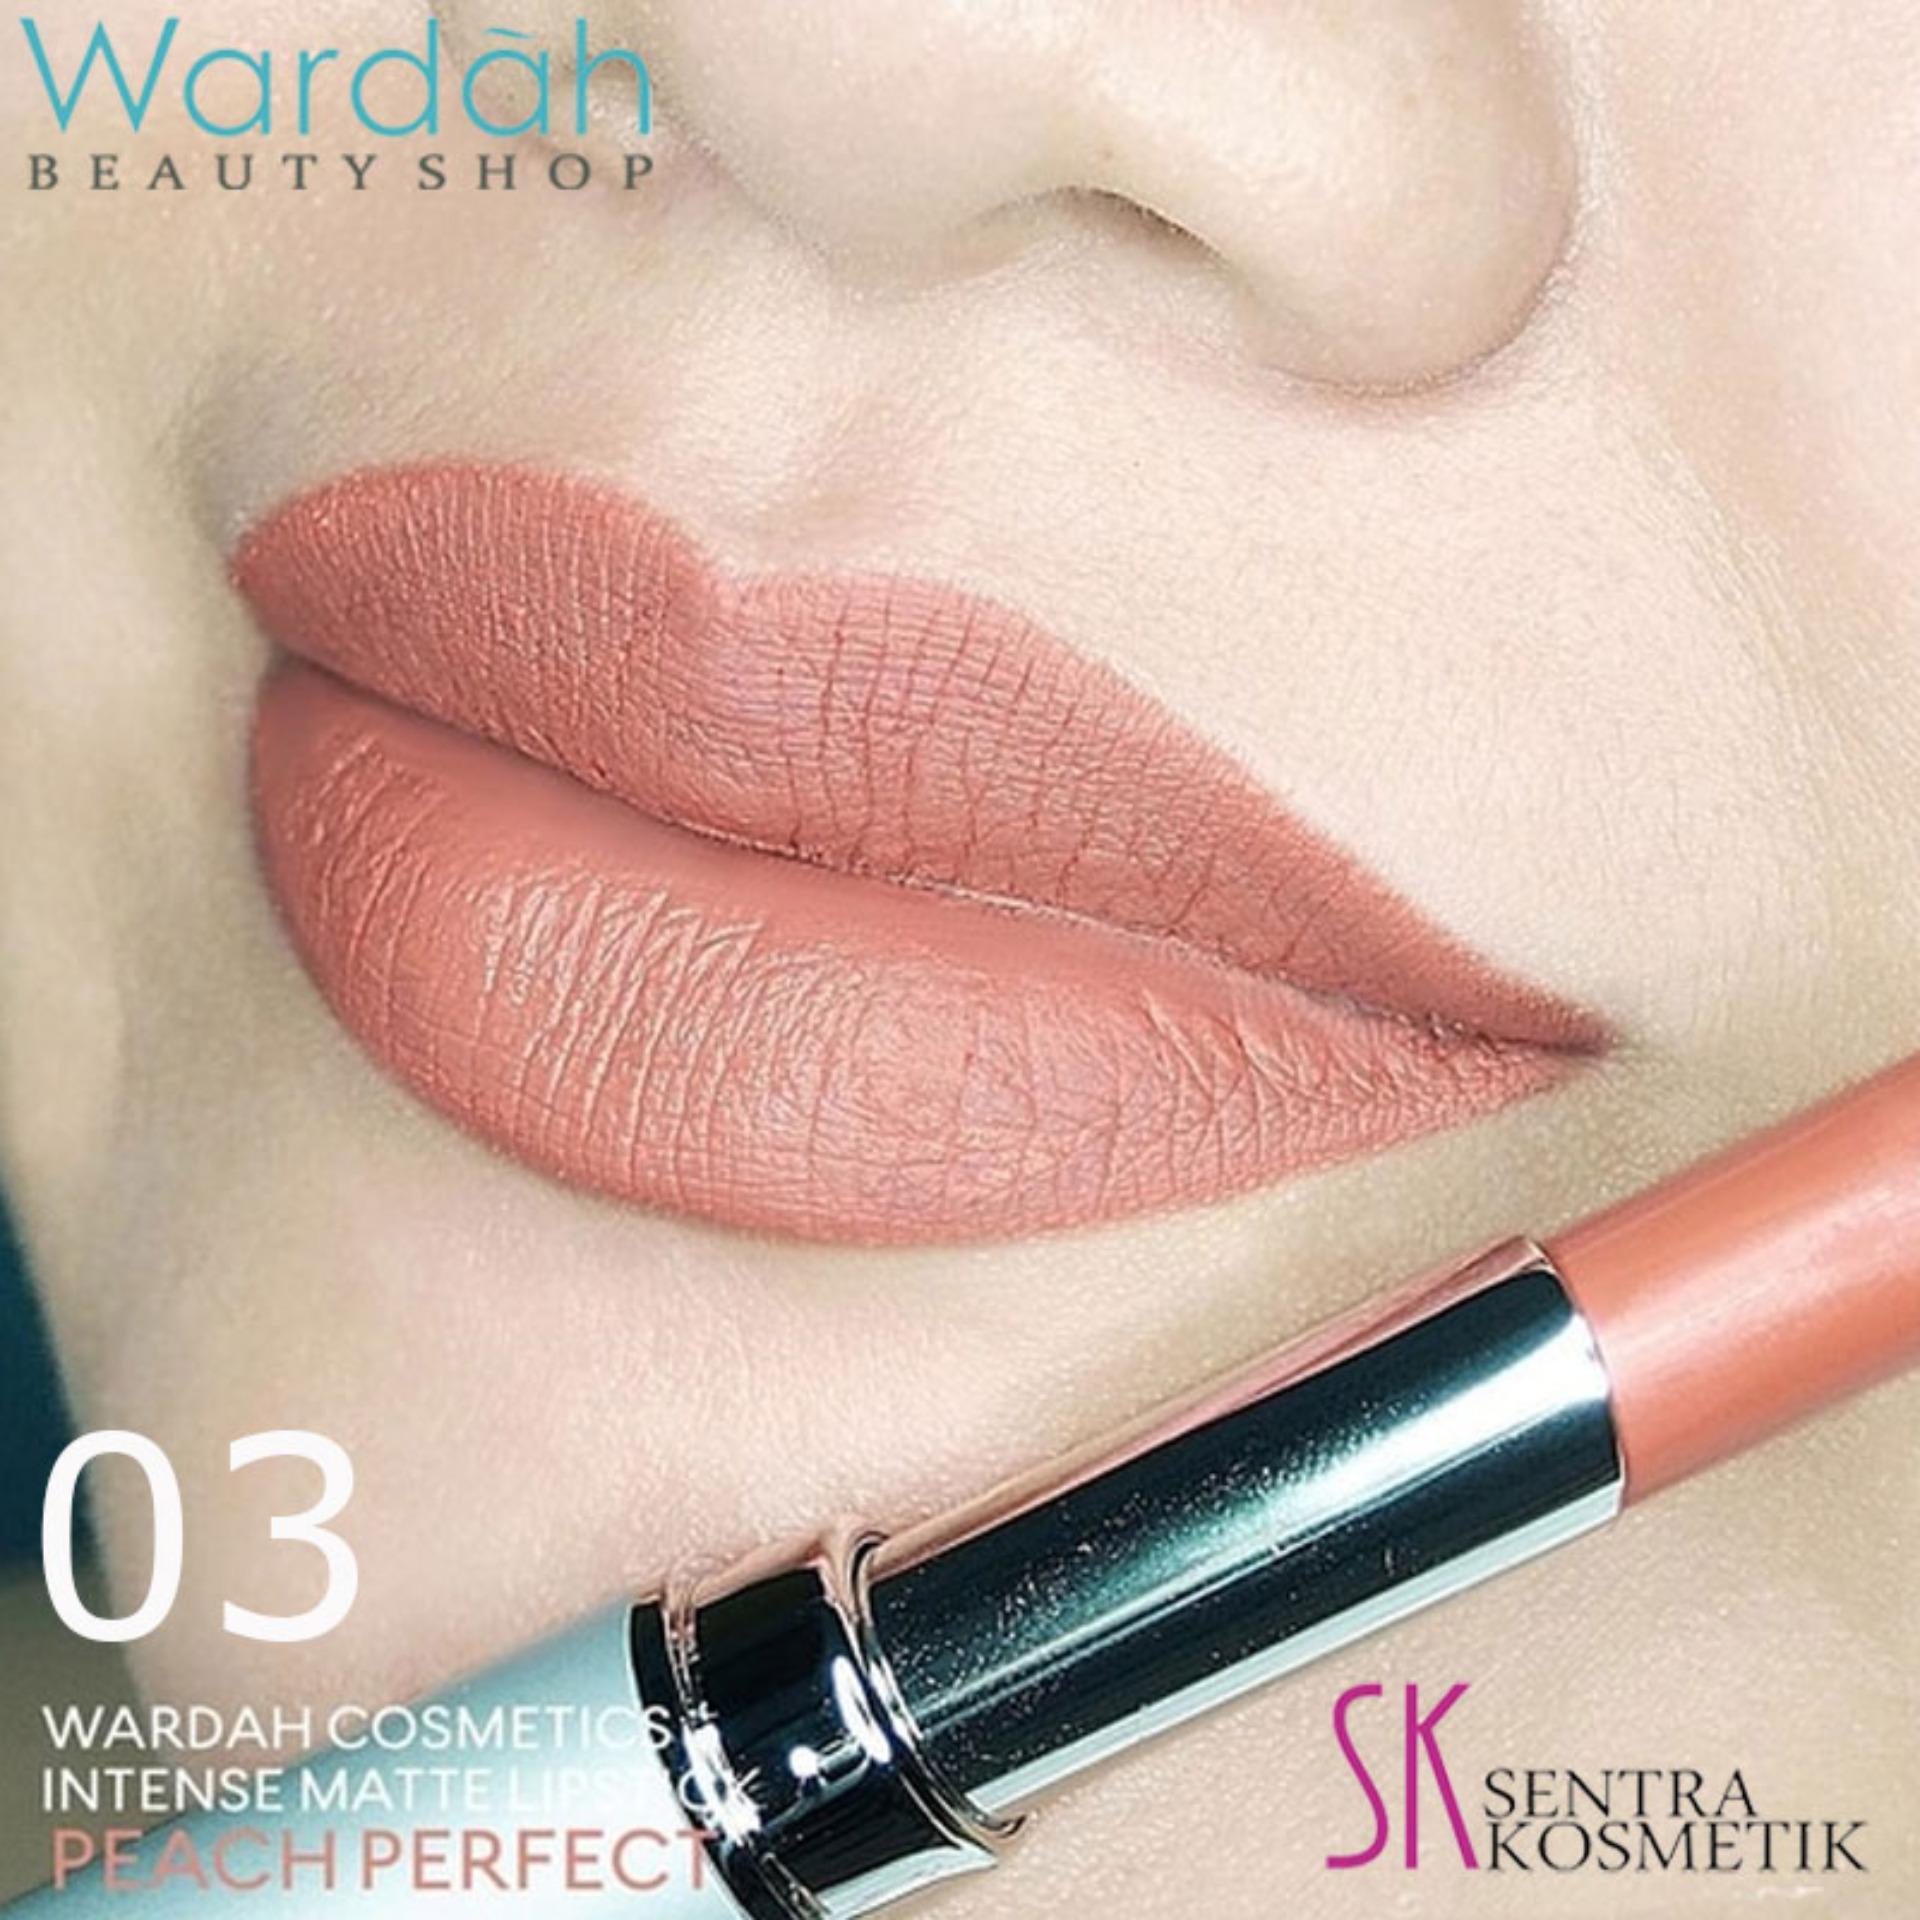 ... Paket Lipstick Matte No 01 Soft Pink Dan Matte No 04 Orange Source Wardah INTENSE MATTE